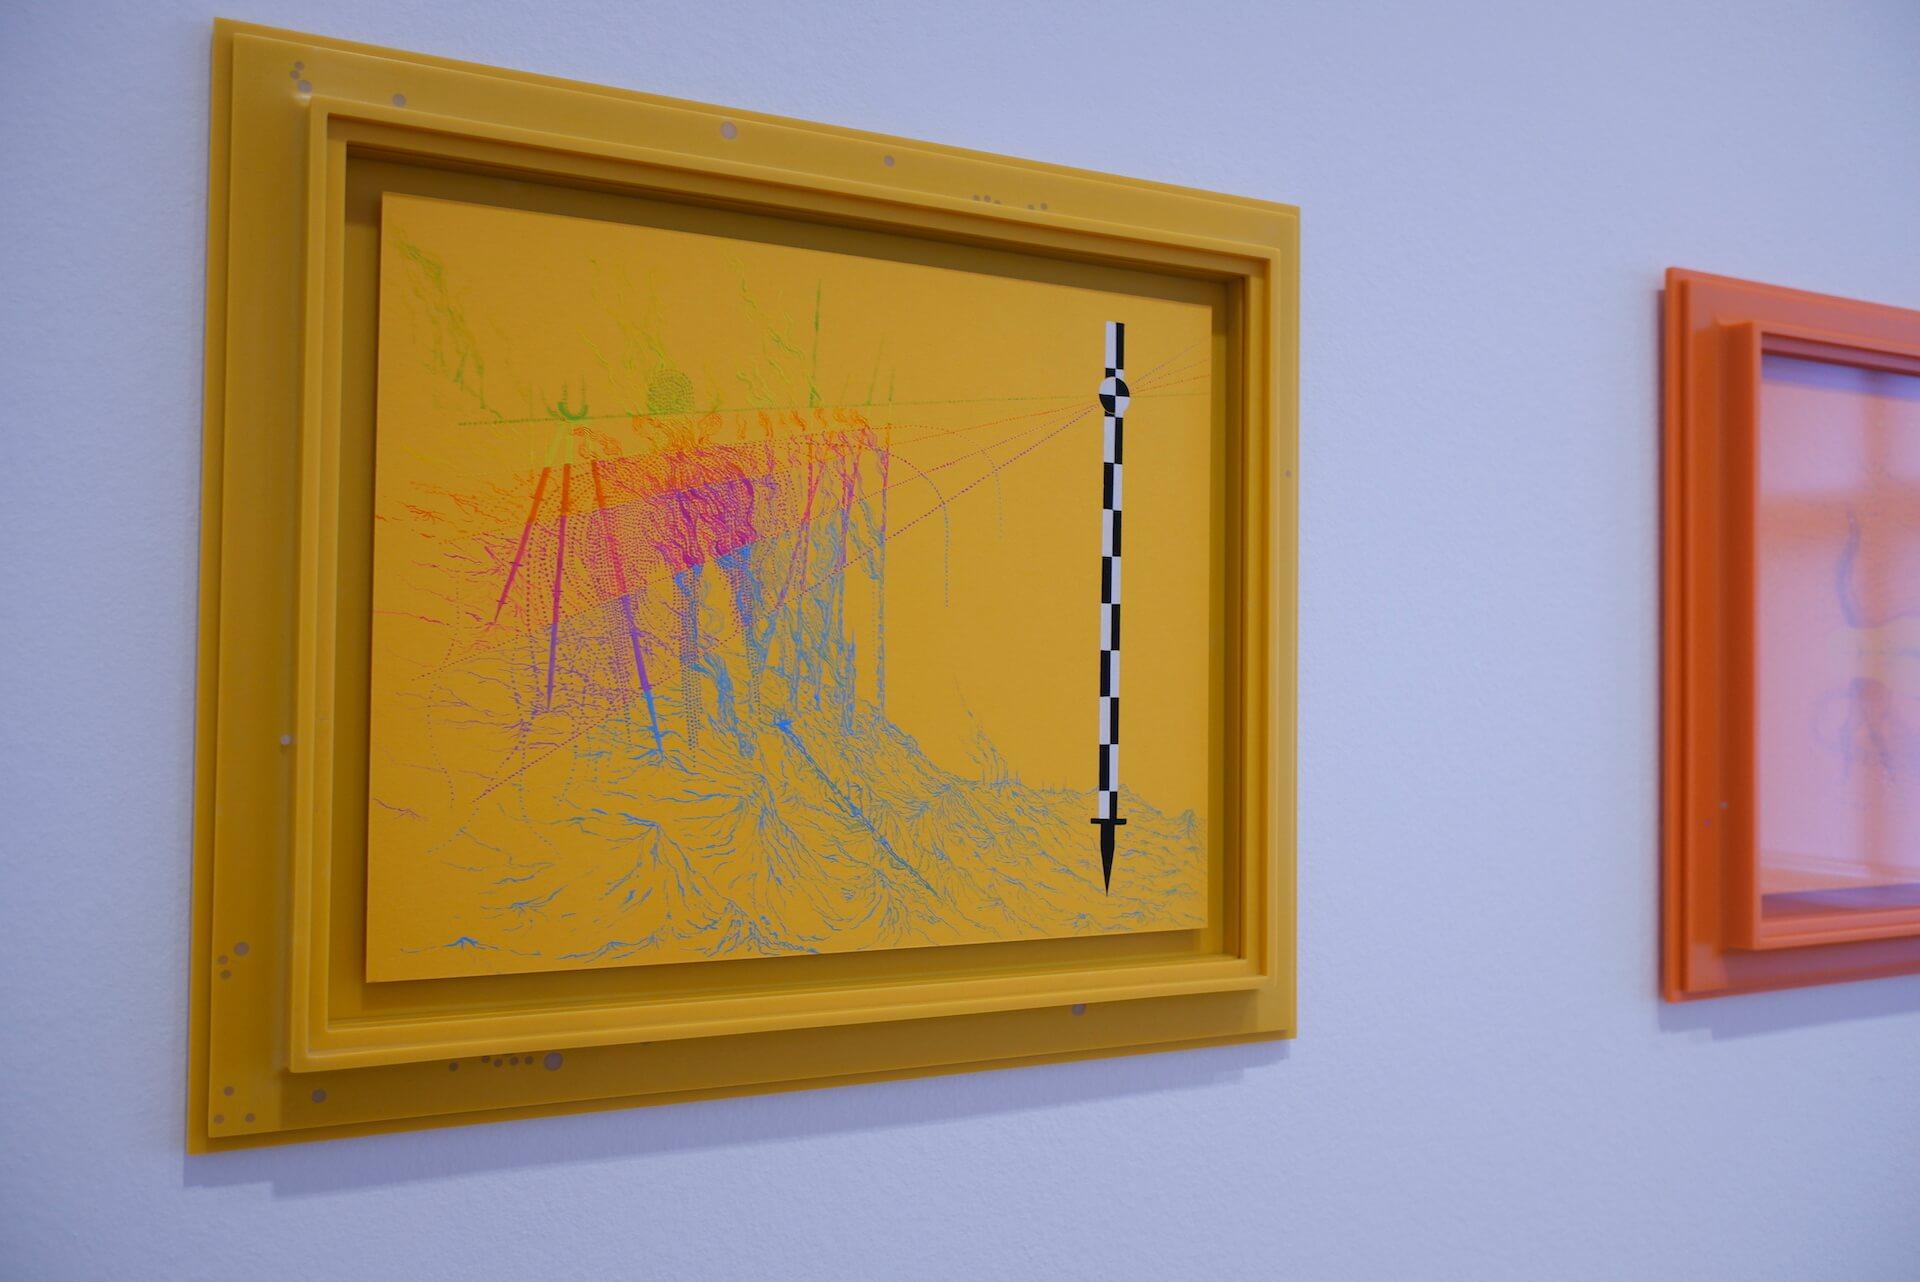 『Berlin Art Week』現地レポート 進化し変化し続けるベルリンのアートカルチャー column210929kana-miyazawa-08